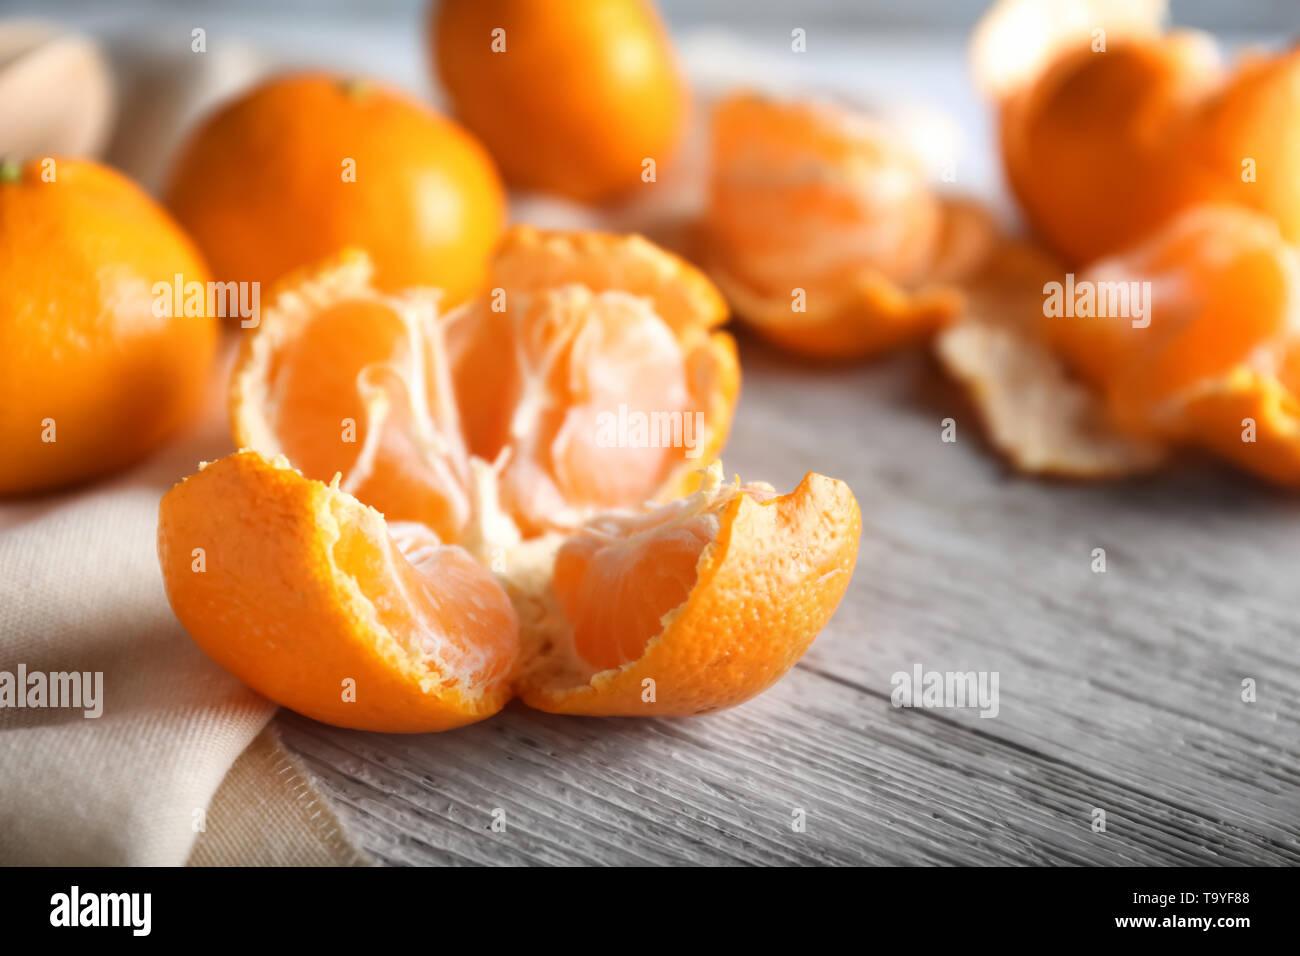 Ripe sweet tangerine on wooden table - Stock Image